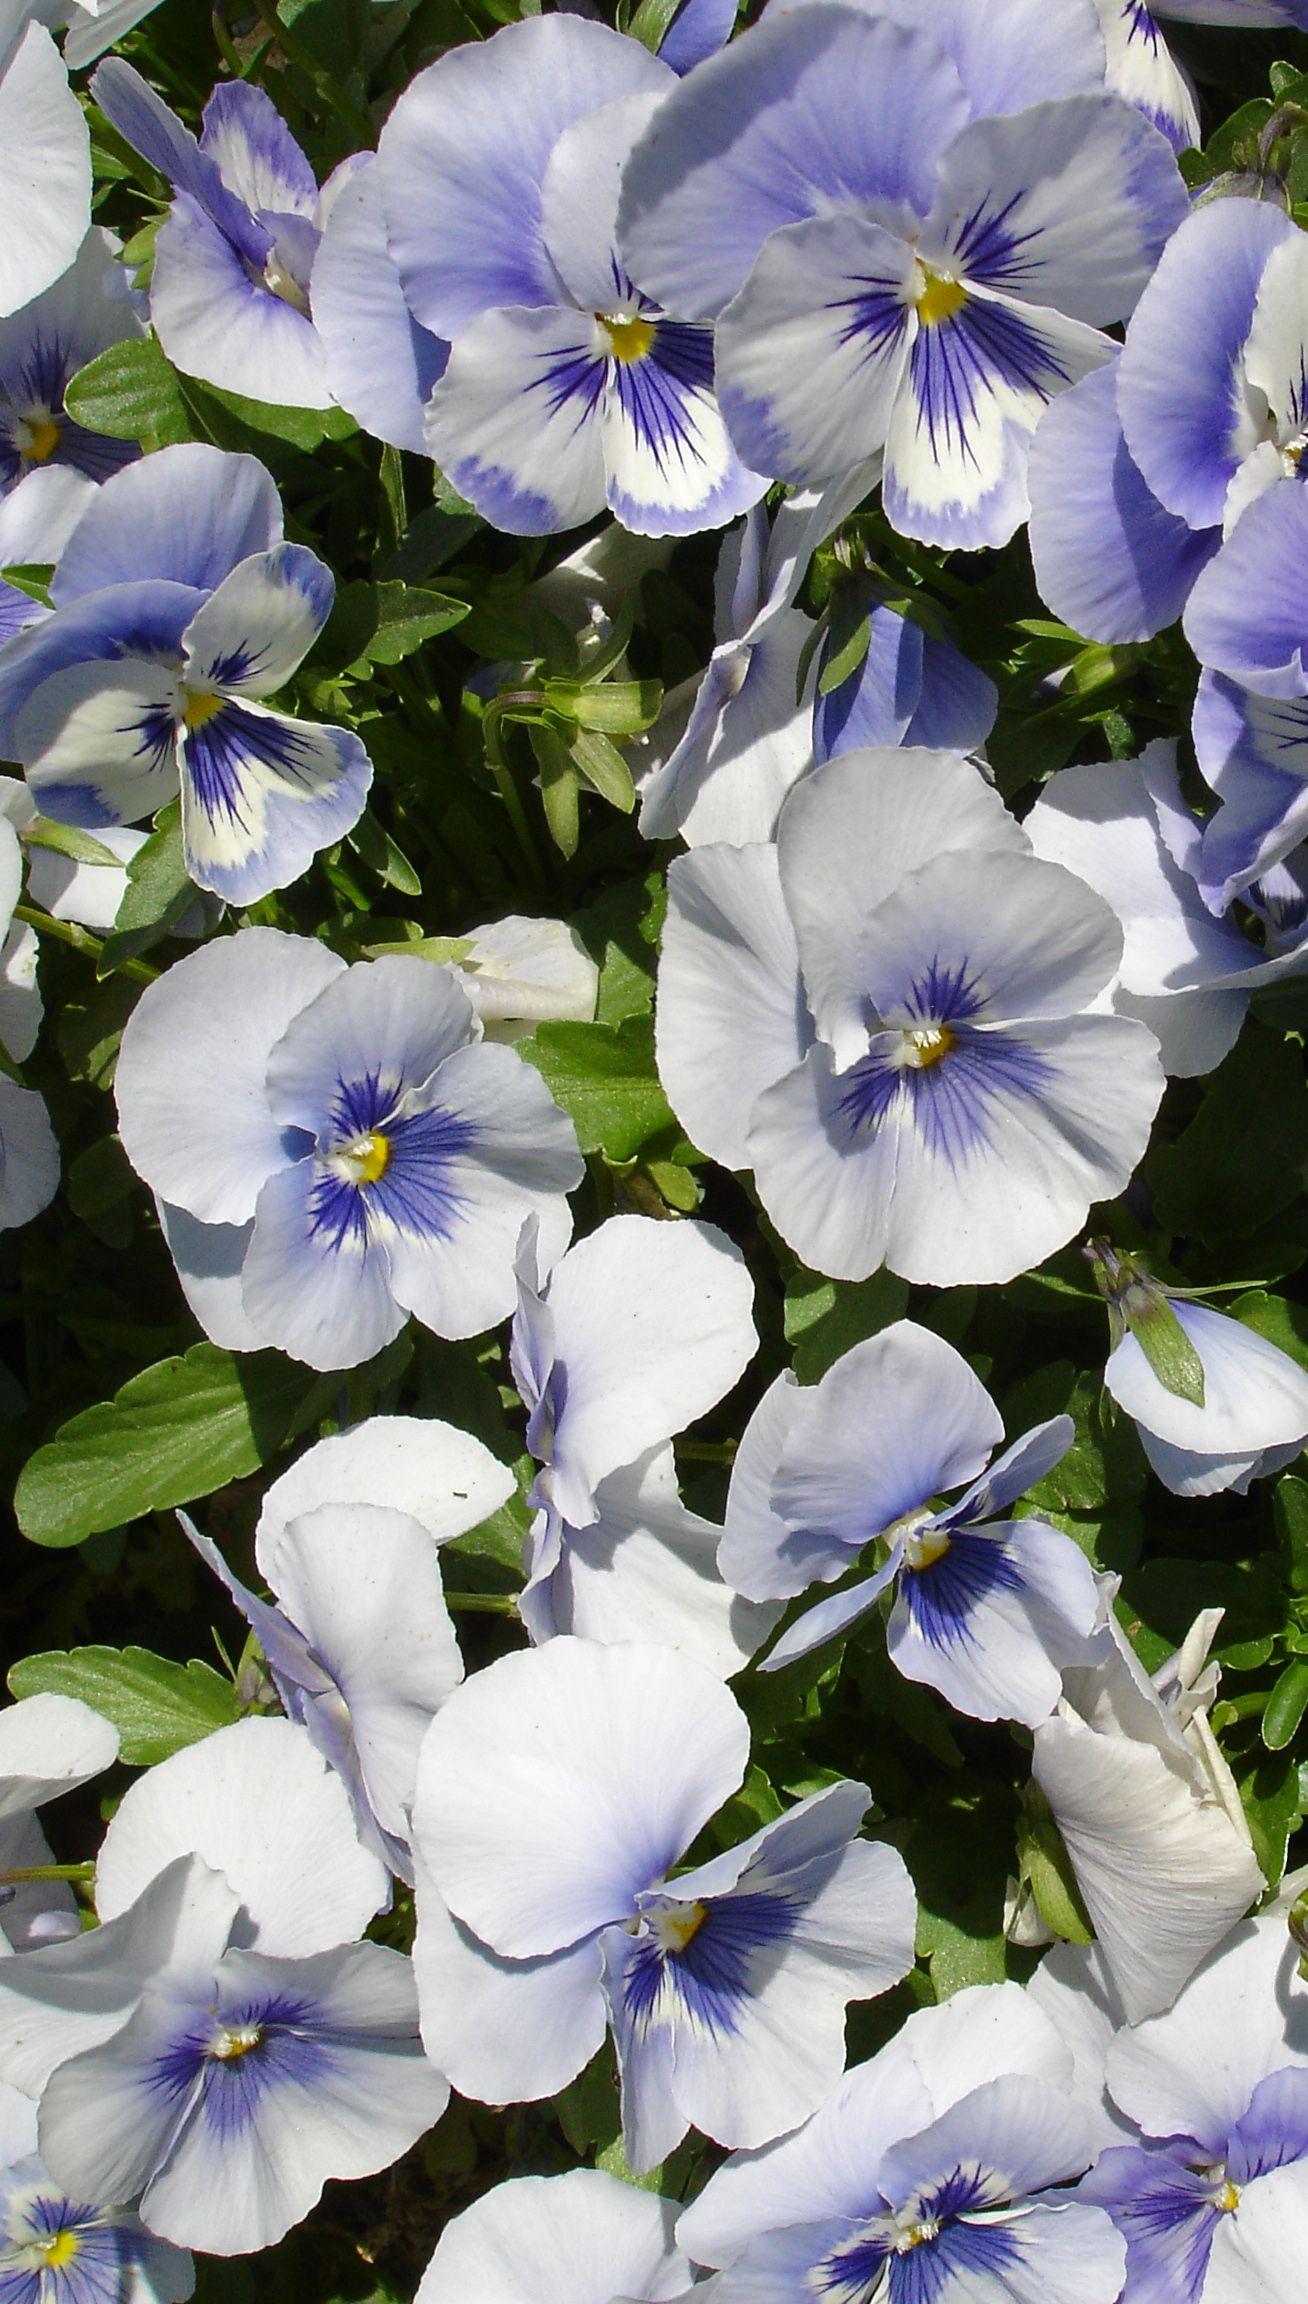 Purple and White Viola Blooming flowers, Beautiful